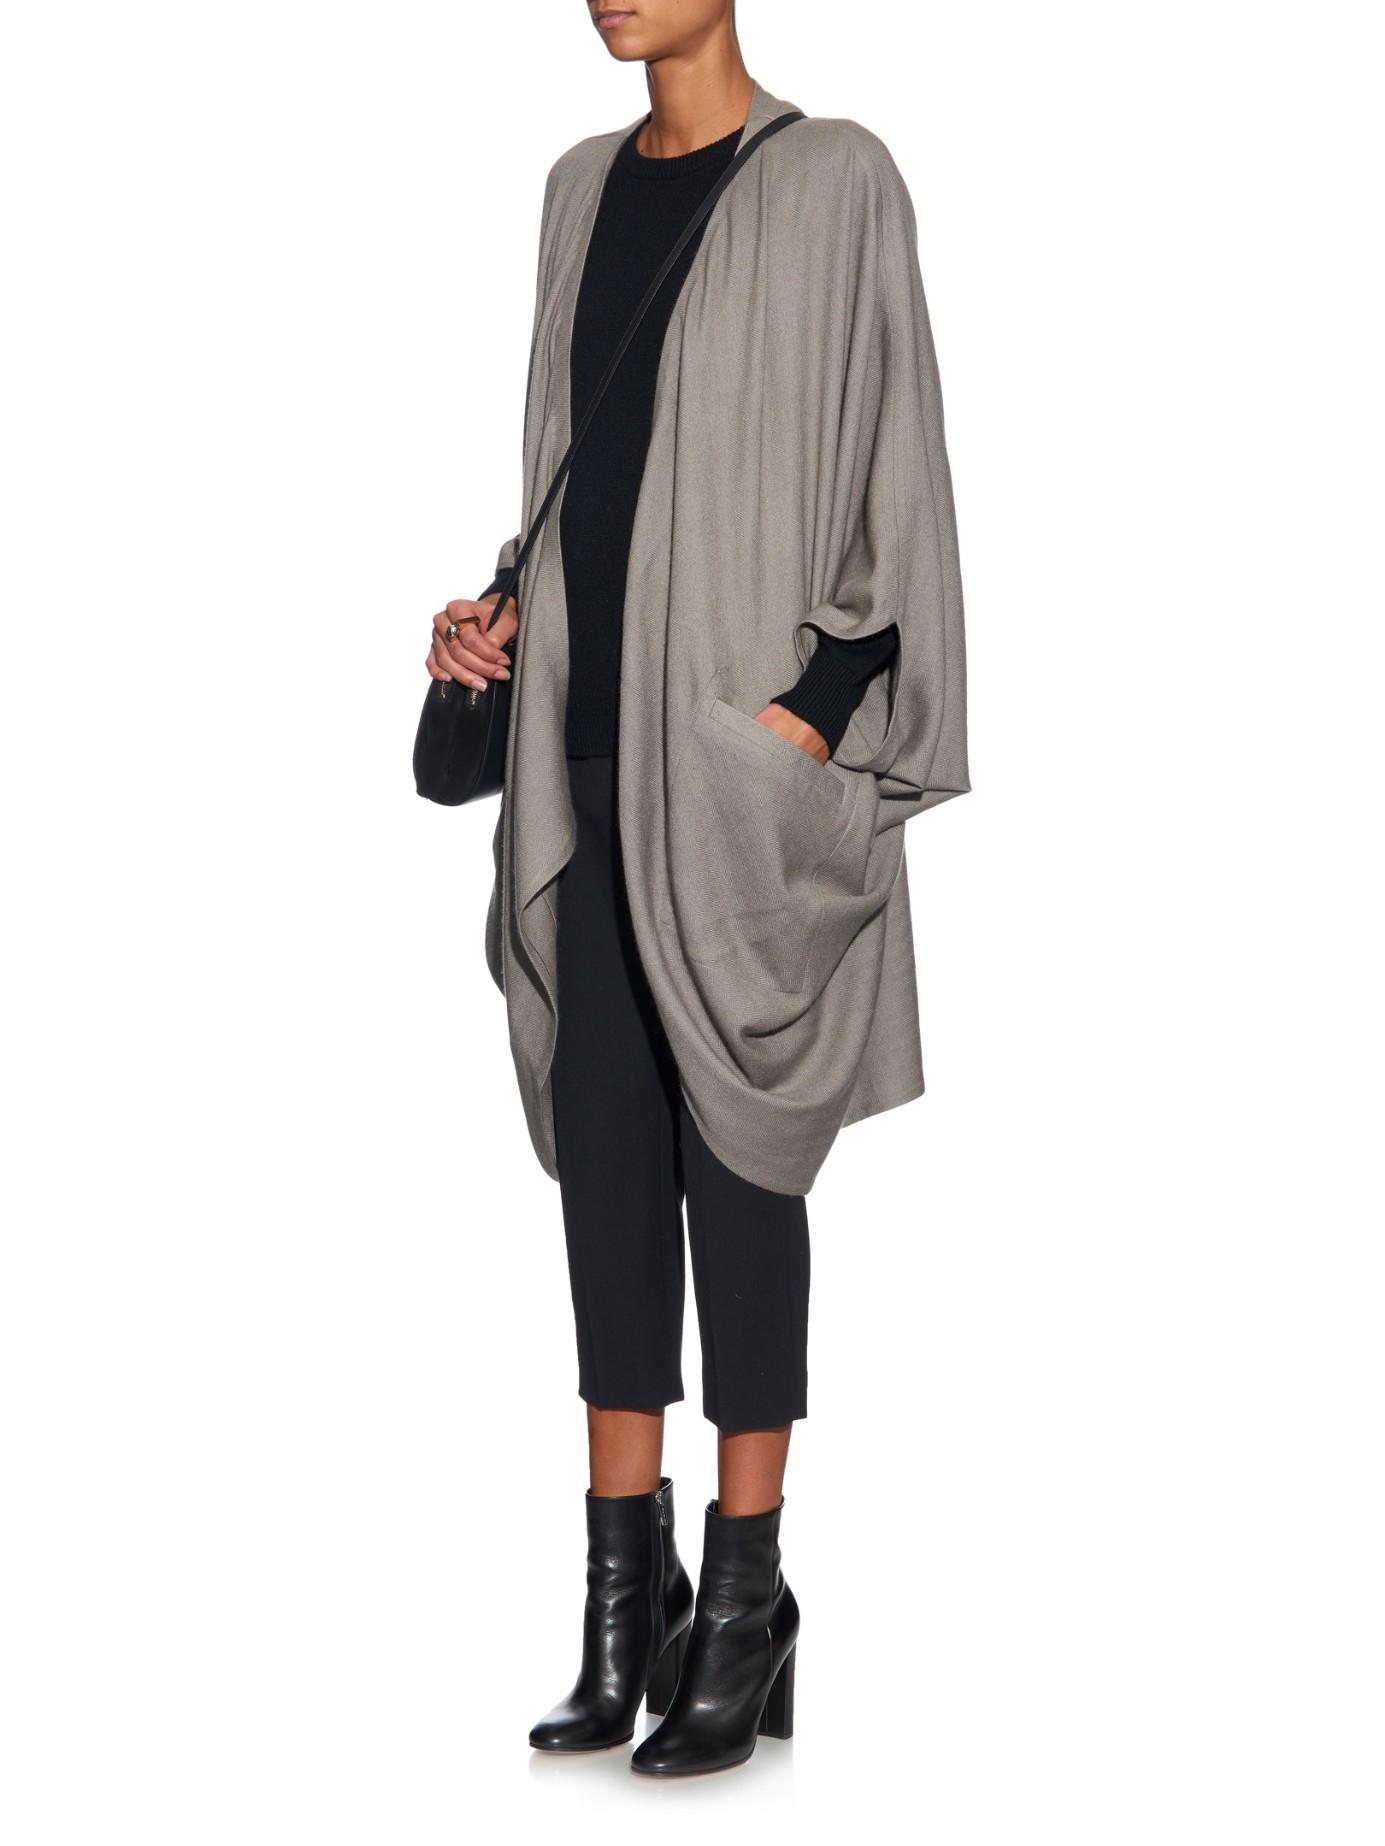 Denis colomb Hand-woven Cashmere Kimono Cardigan in Gray | Lyst